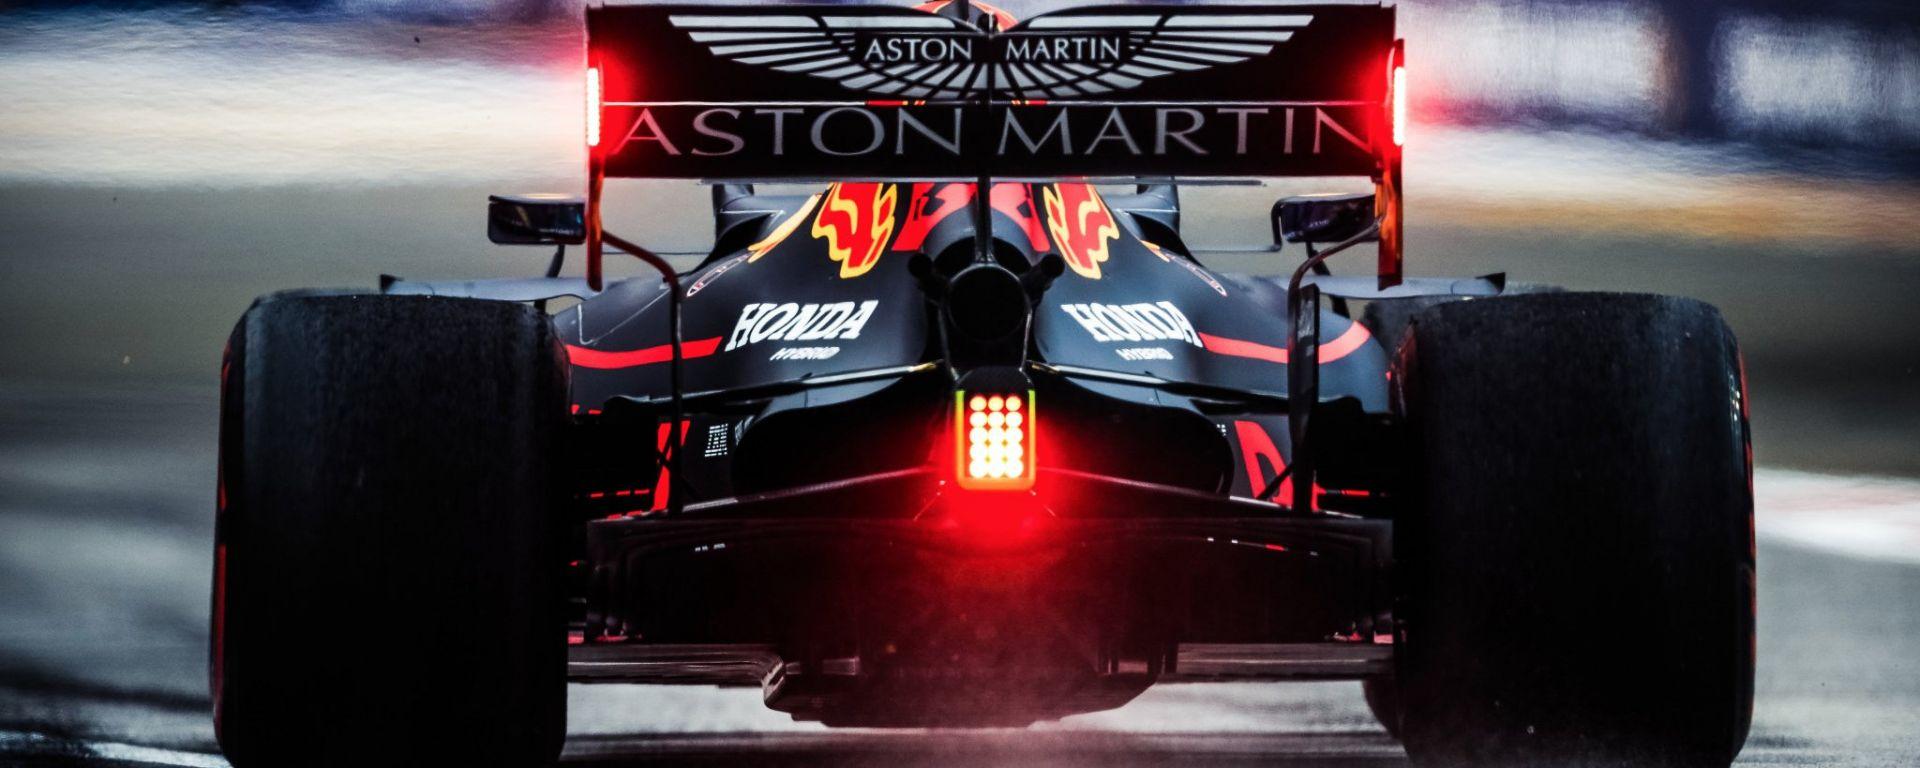 F1 GP Singapore 2019, Marina Bay: Max Verstappen (Red Bull)